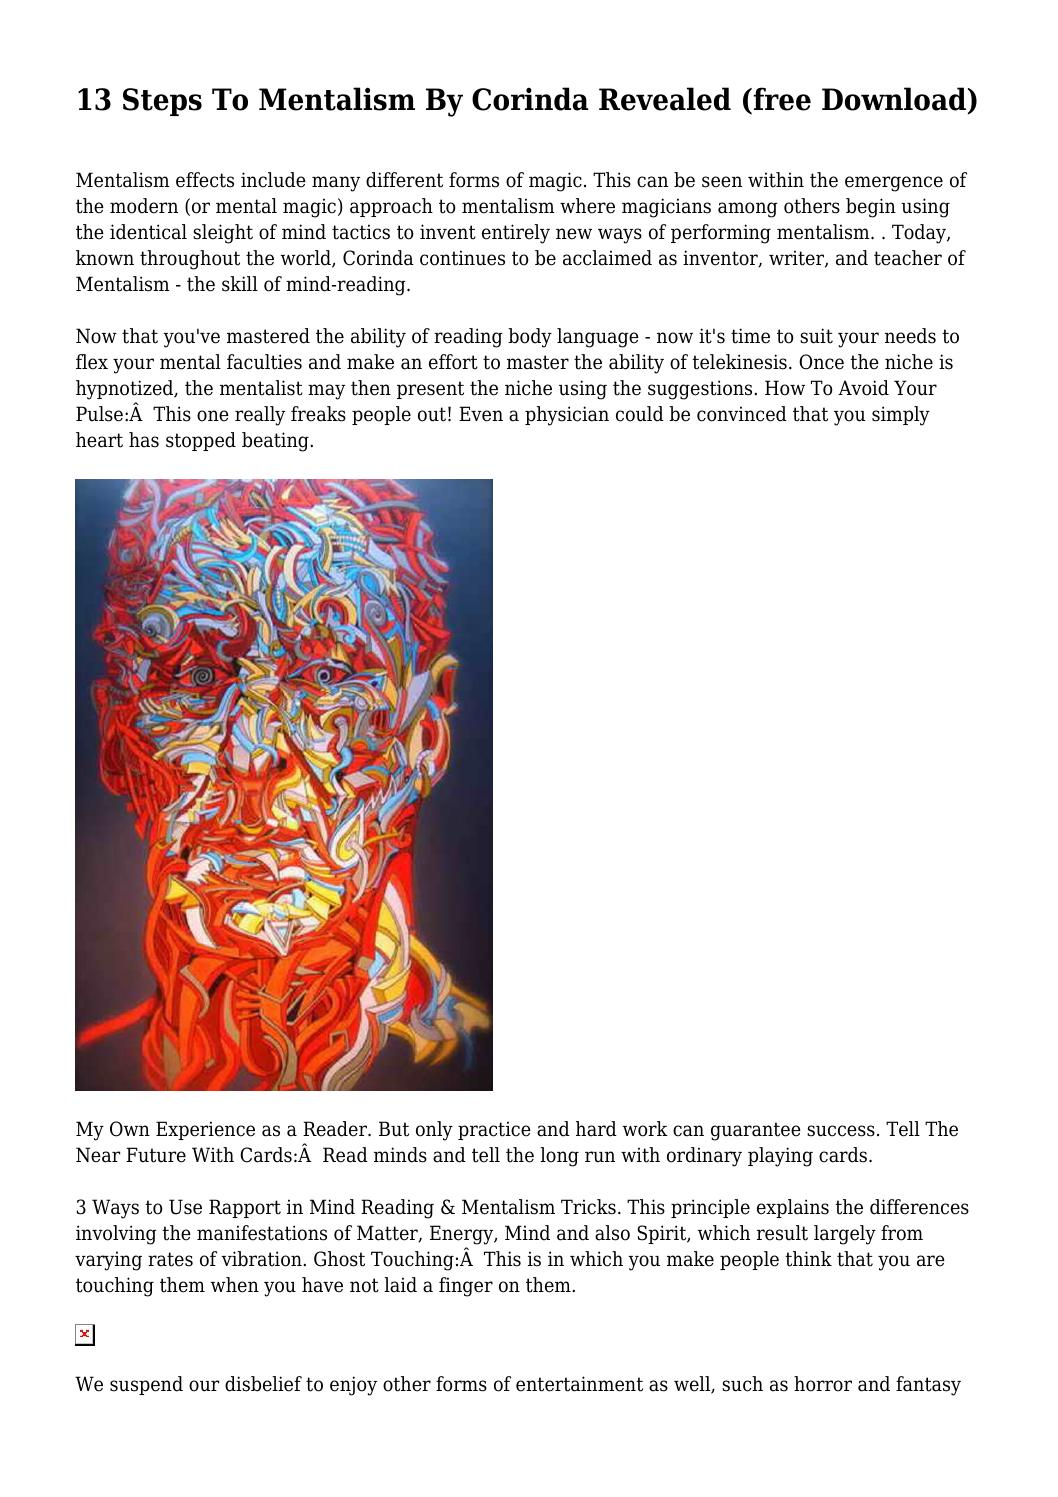 13 steps to mentalism by corinda pdf free download